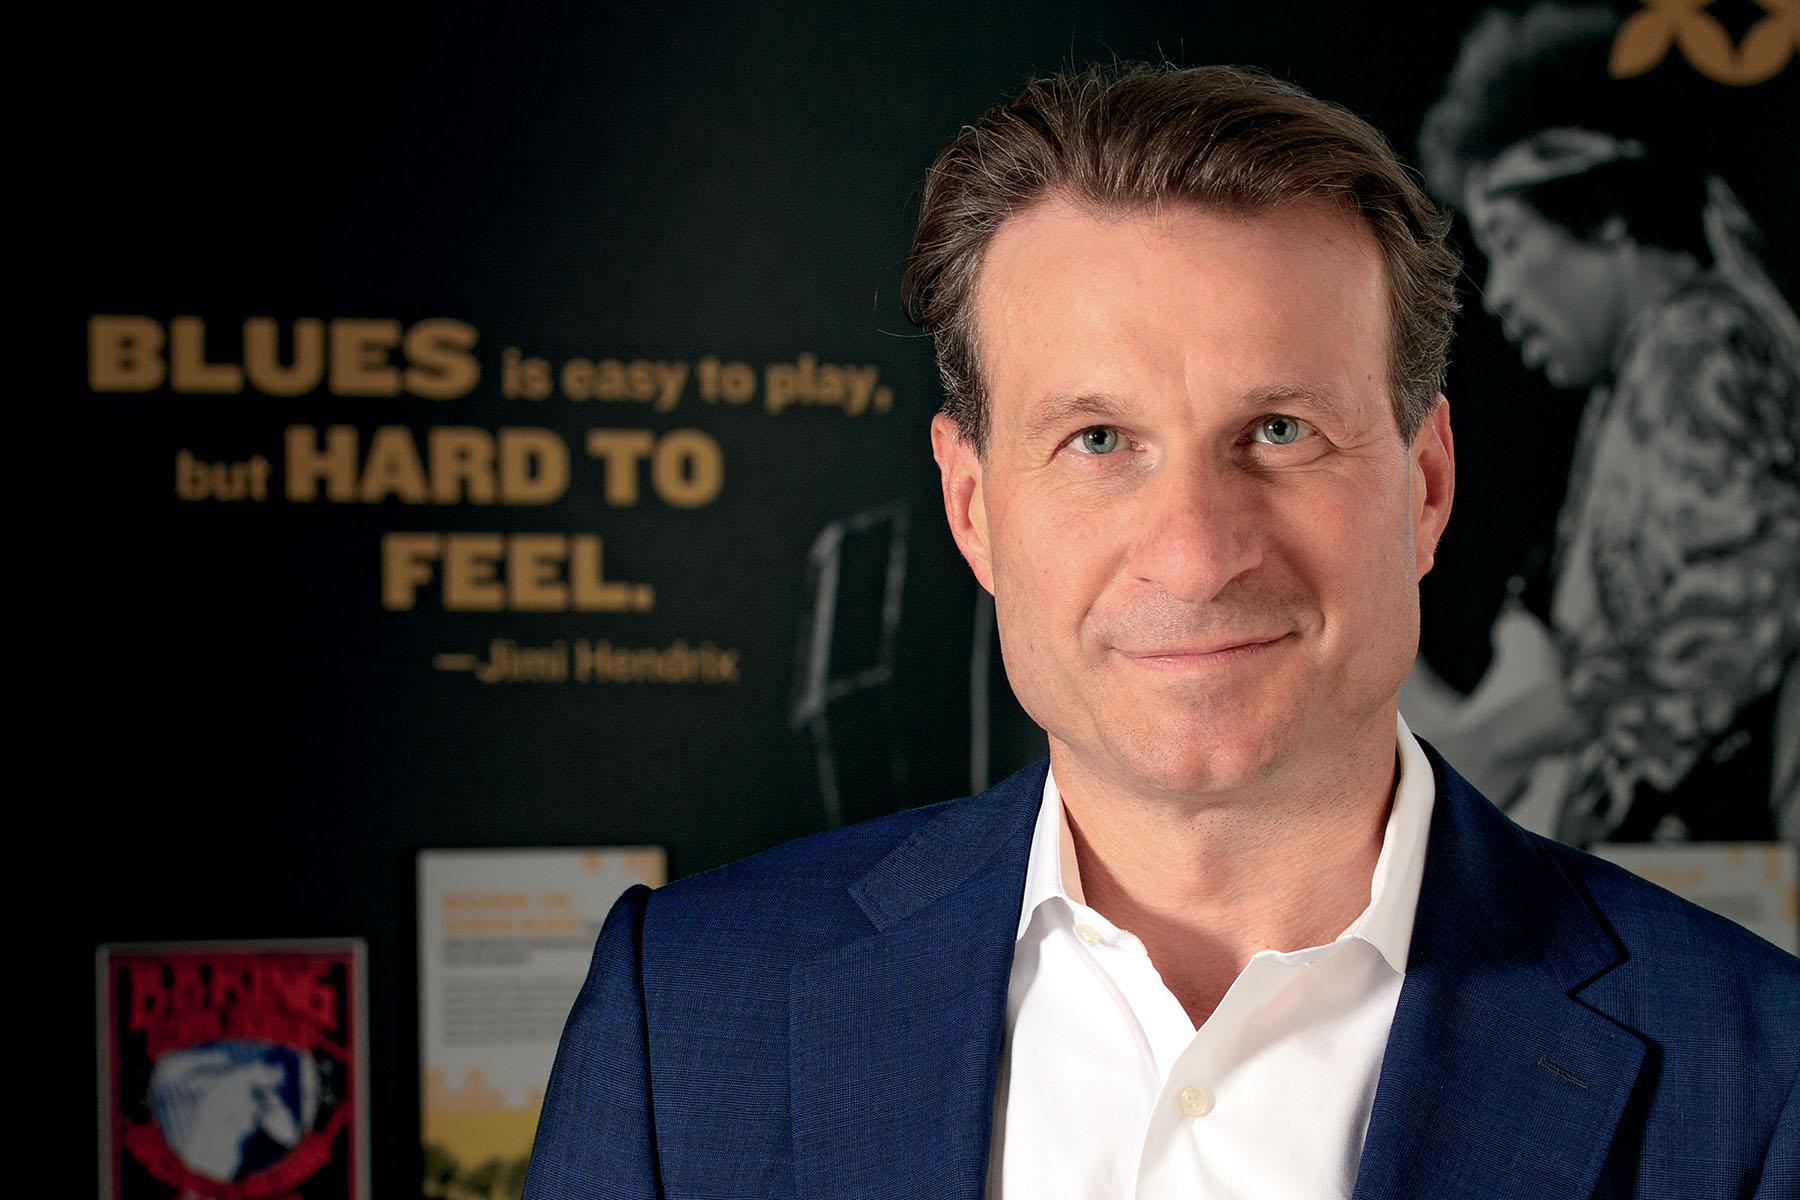 Roel Vestjens, President and CEO of Belden